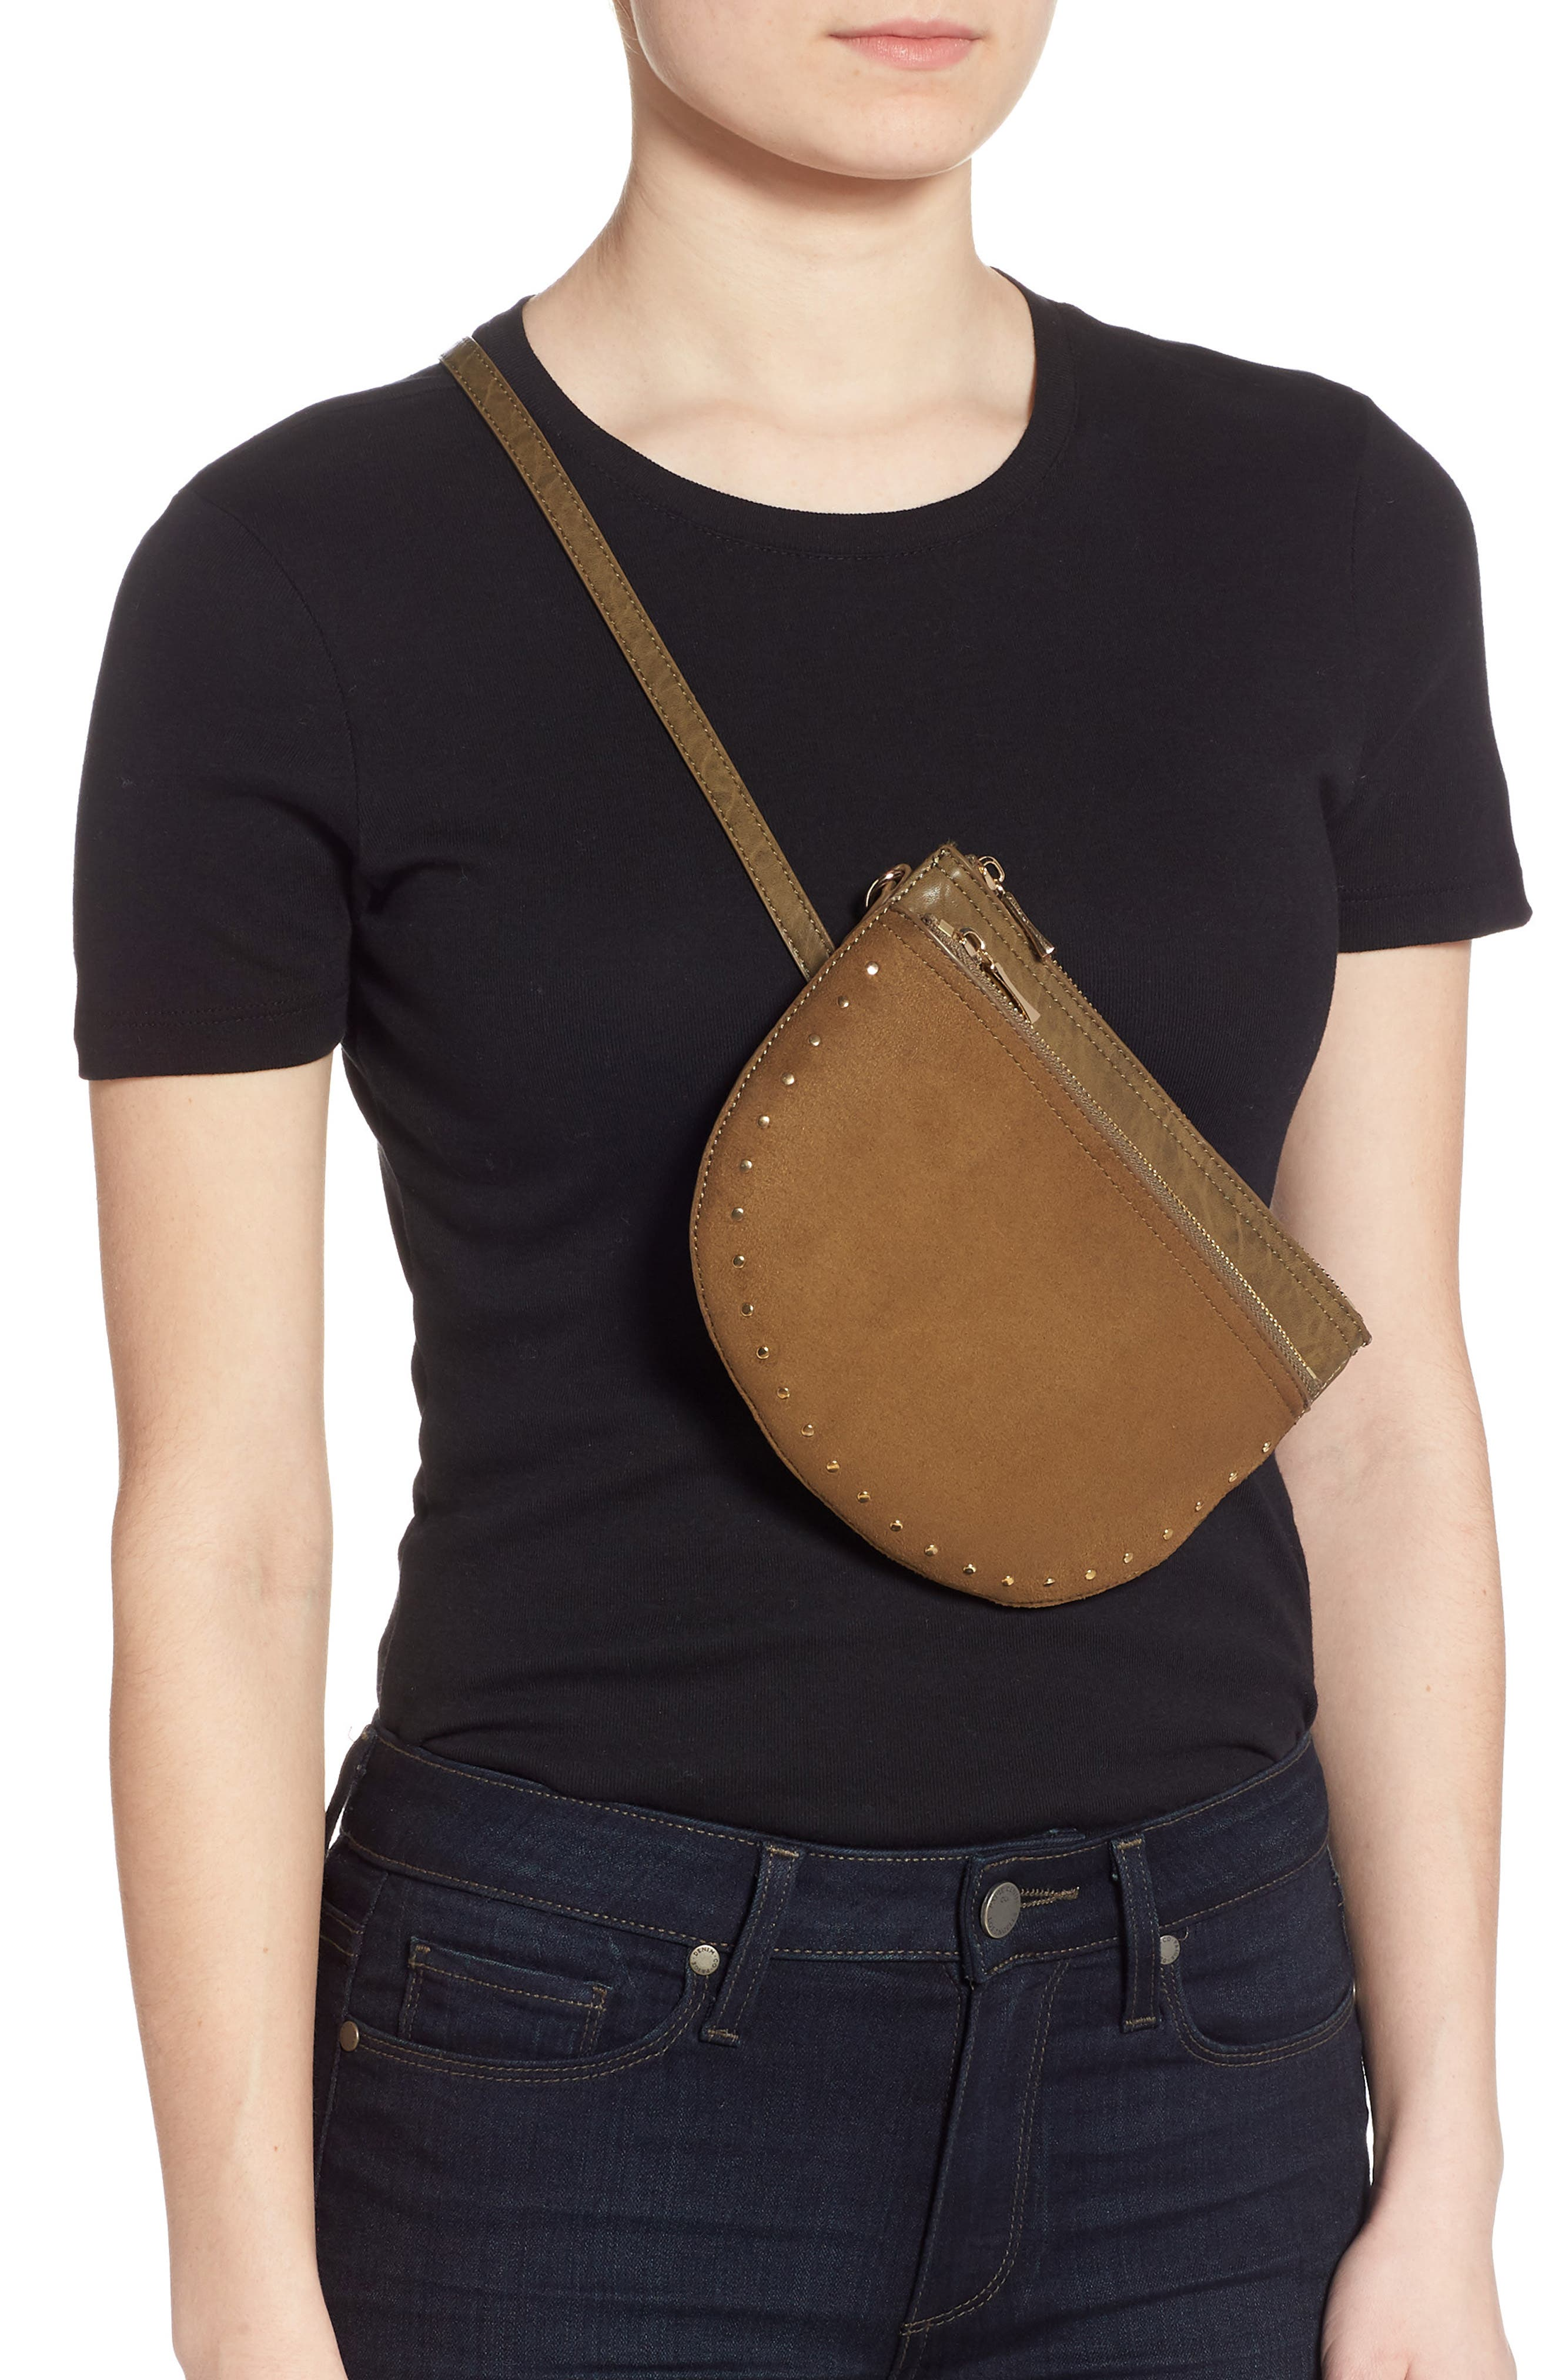 SOLE SOCIETY, Jeana Studded Convertible Belt Bag, Alternate thumbnail 3, color, OLIVE